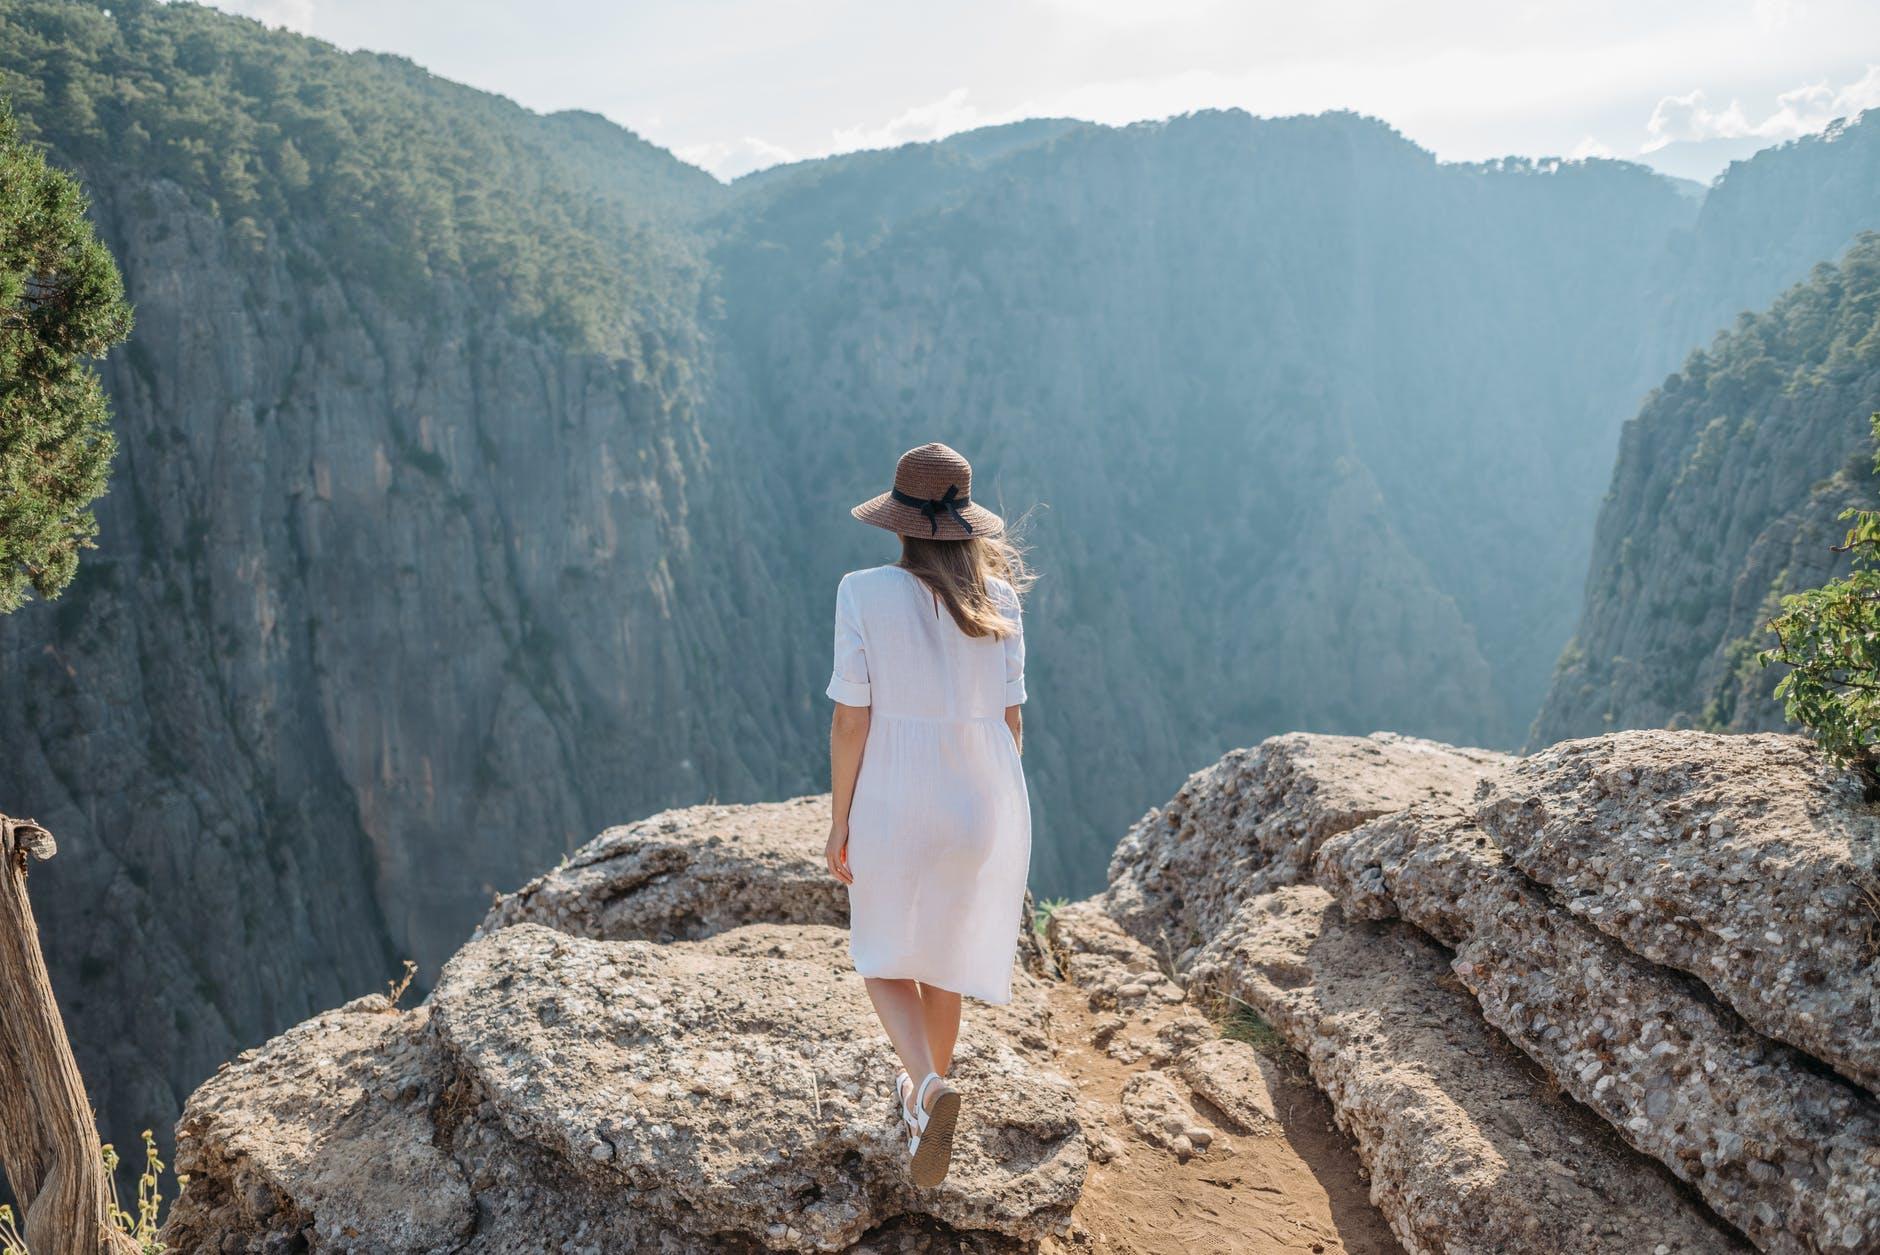 woman walking near a cliff